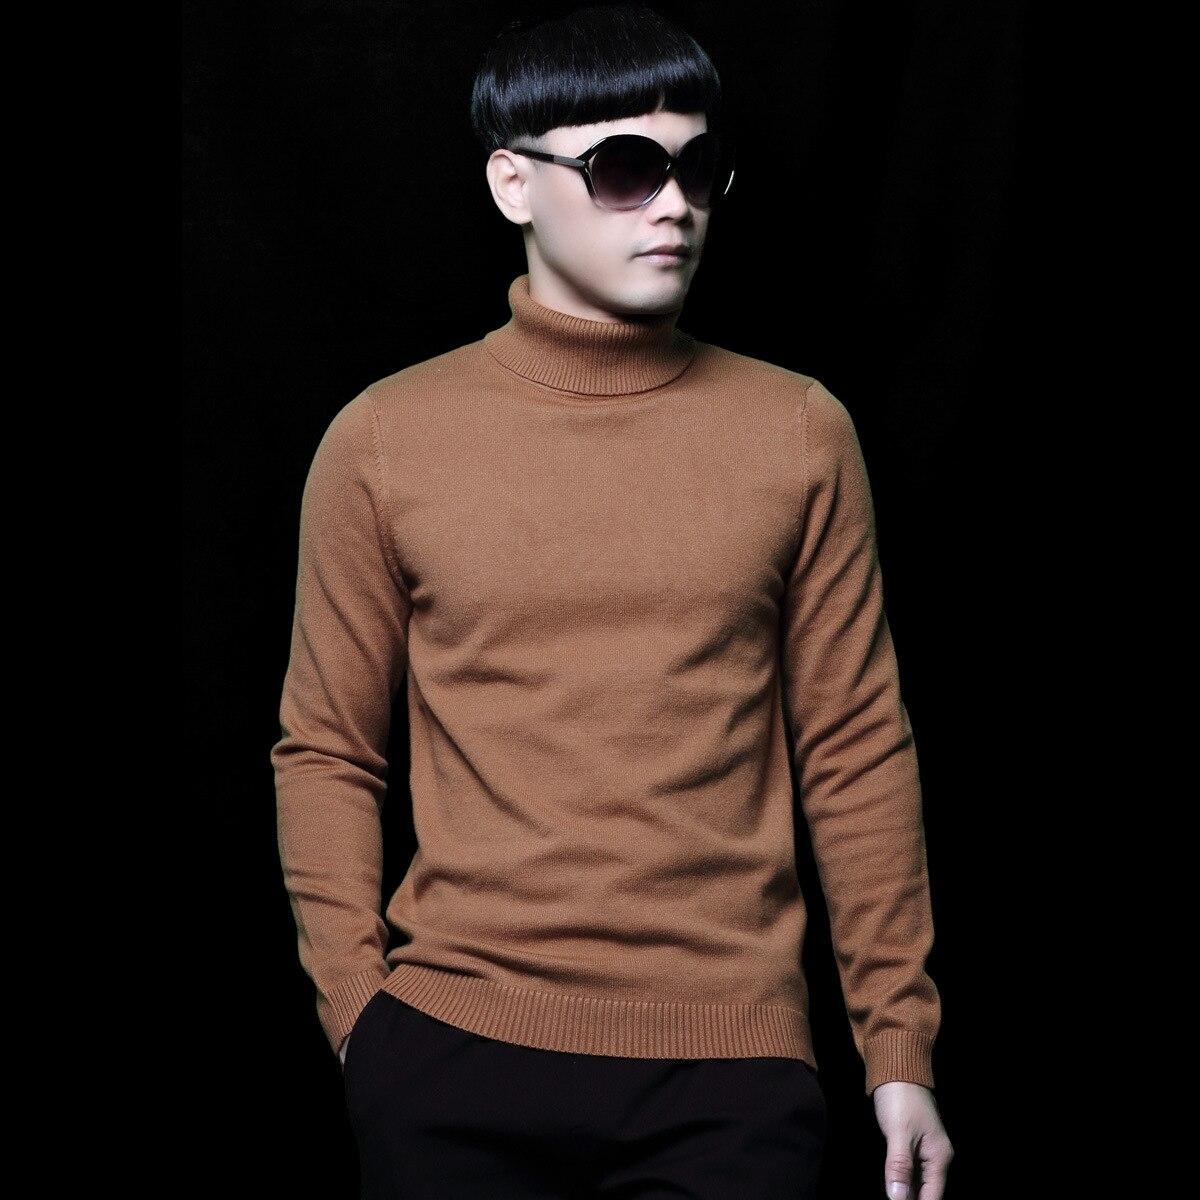 Oversized Sweaters Mens Long Sleeve Boys Brown Sweater Male Winter Knitted Turtleneck Pullover New Arrival Men Knitwear 4xl 5xl